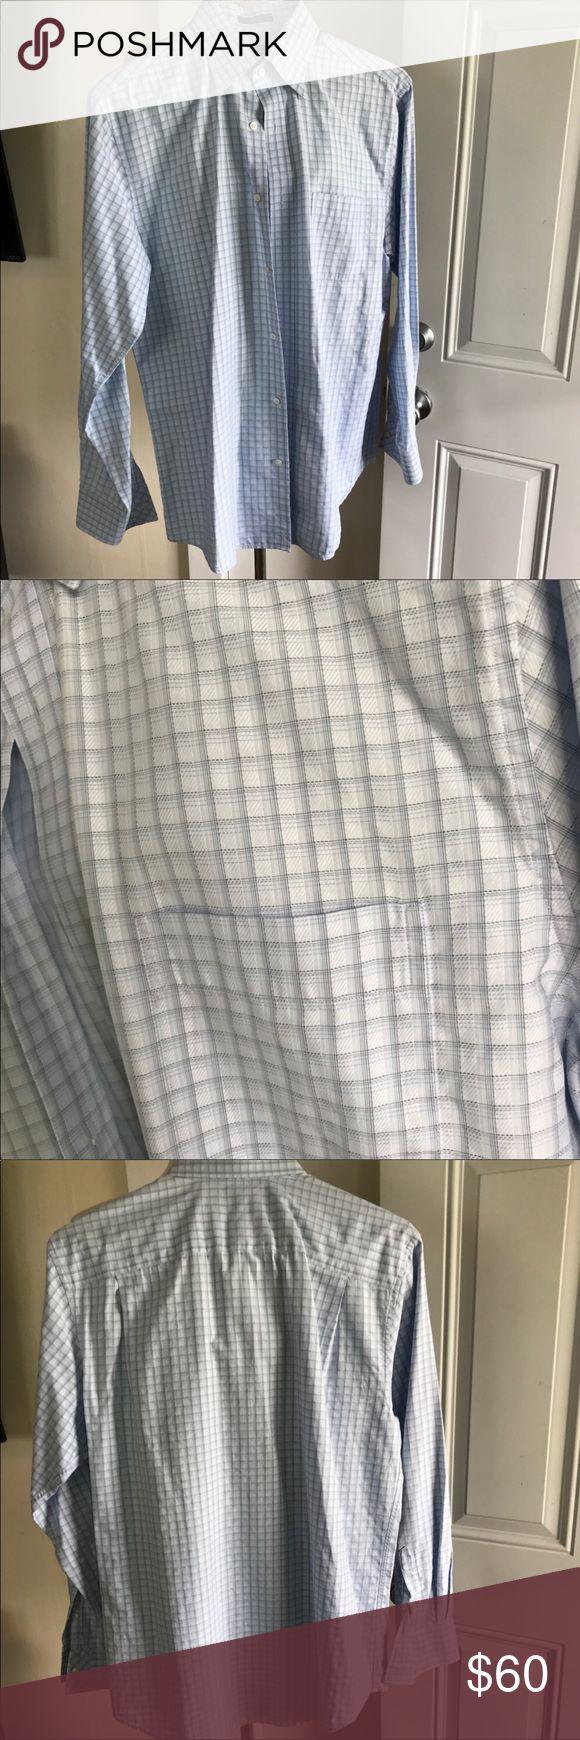 John W. Nordstrom signature plaid dress shirt New condition. John W. Nordstrom signature plaid dress shirt. Tasteful texturing defines a sharp dress shirt cut from Cotonifico Albini® cotton. White and blue plaid. Size medium. John W. Nordstrom Shirts Dress Shirts